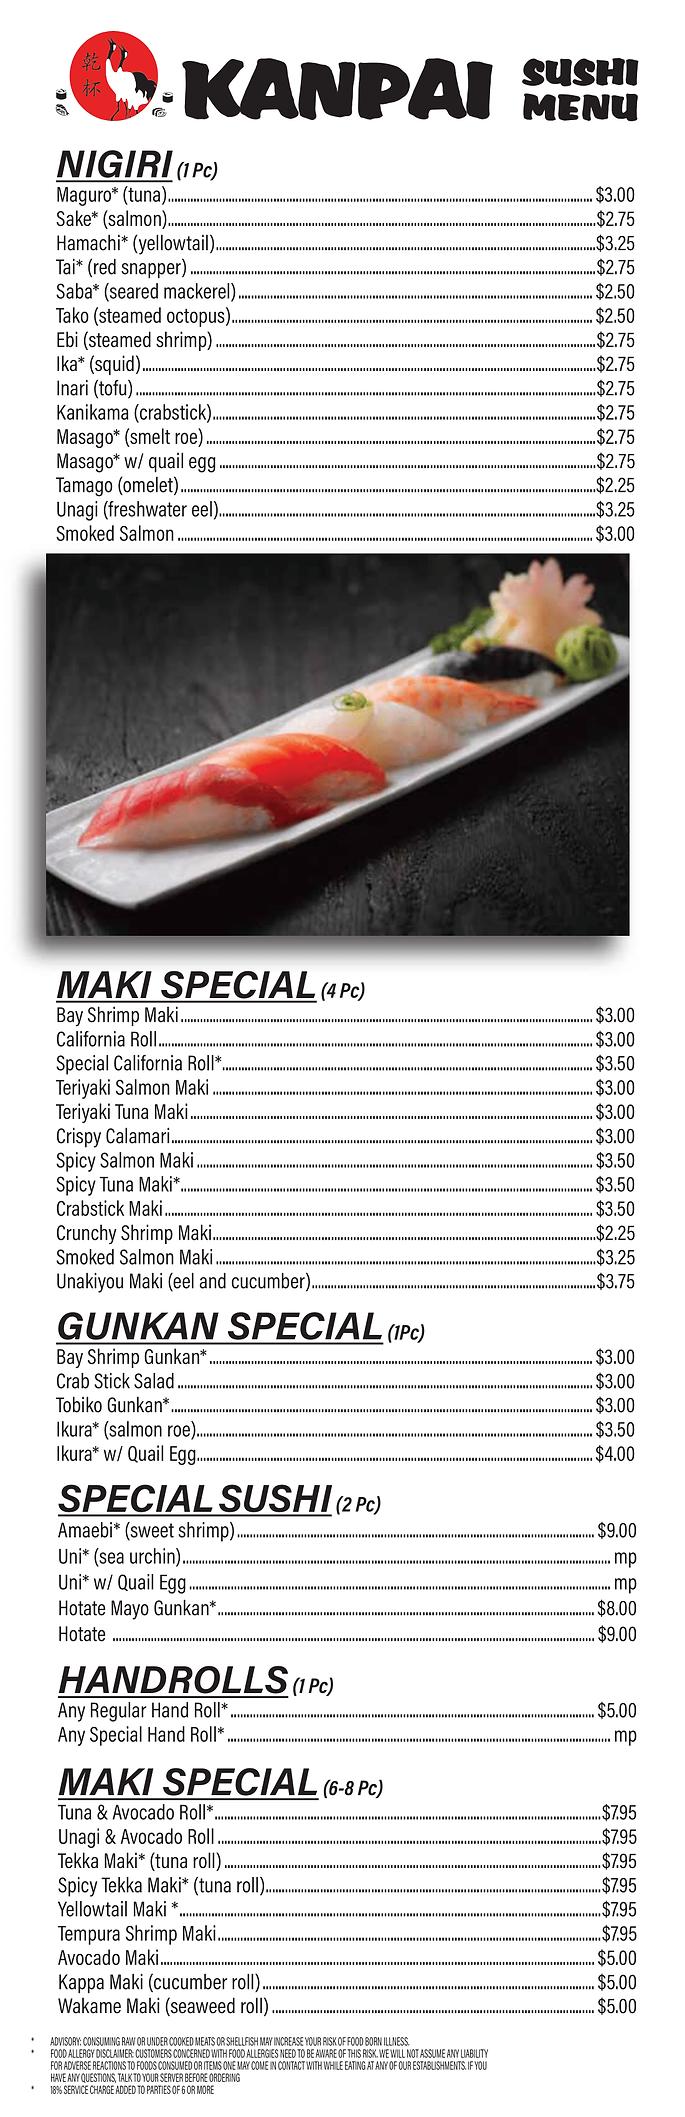 KanPai Sushi Menu PROOF-1.png